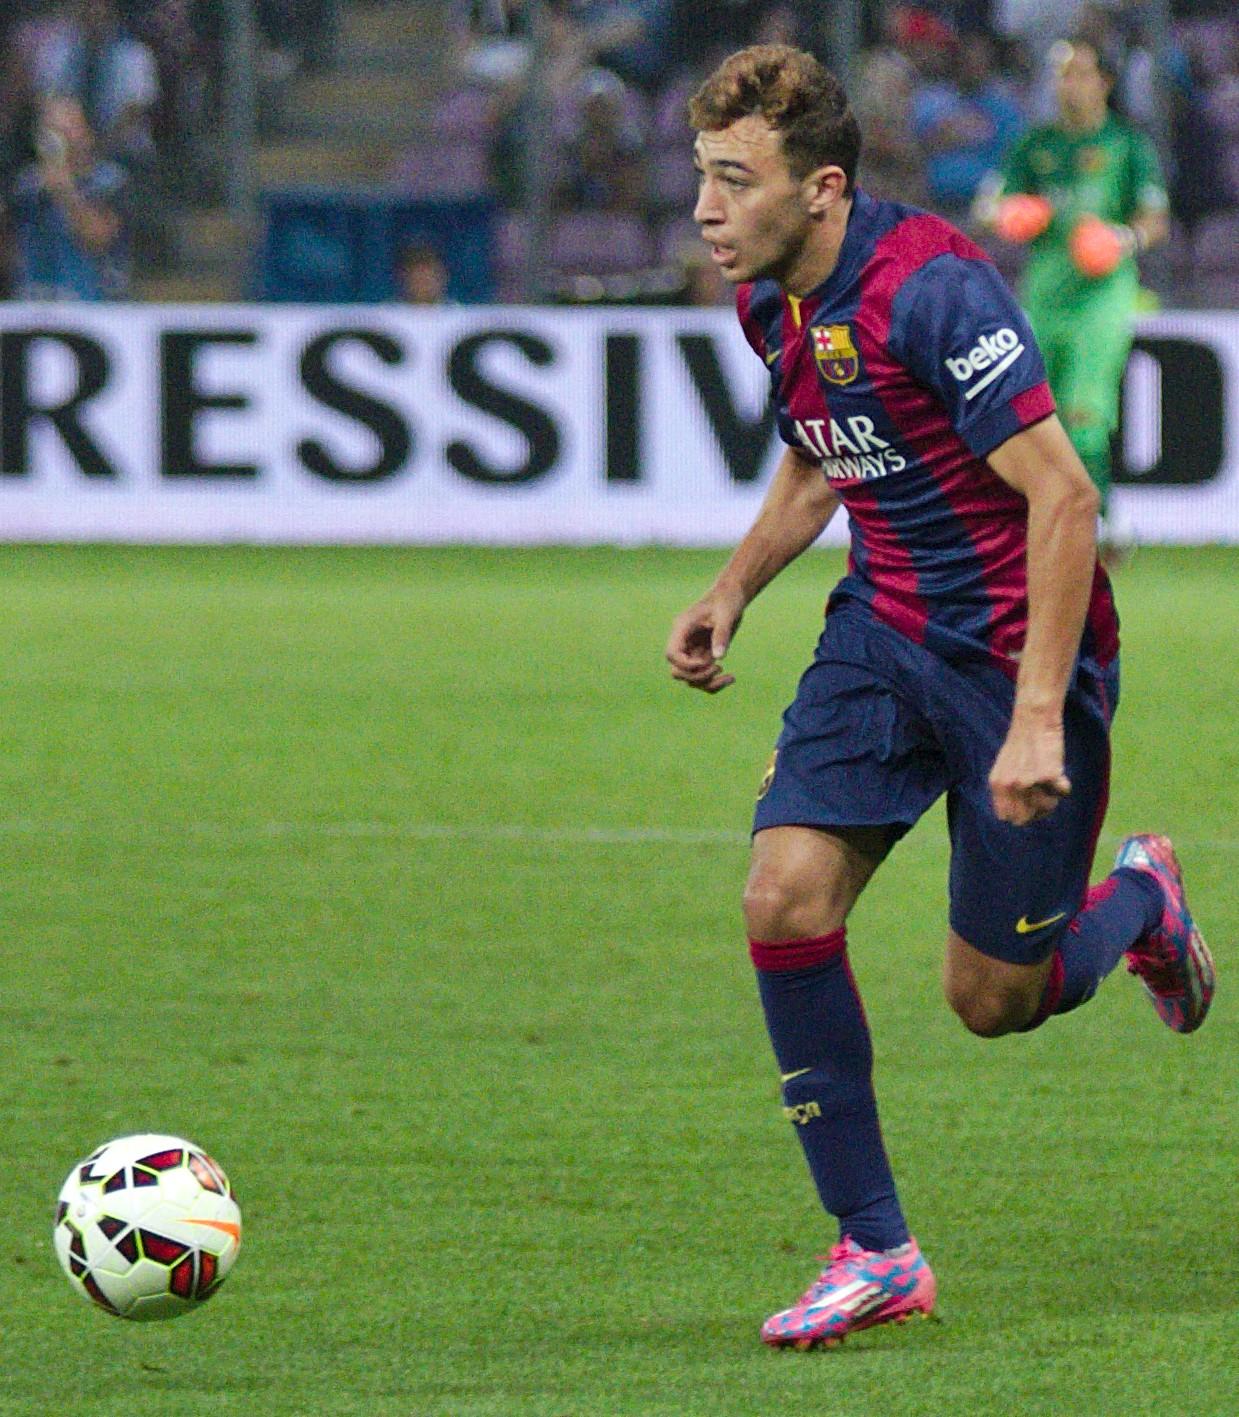 Munir El-Haddadi: Profile of Barcelona's newest star | The Independent